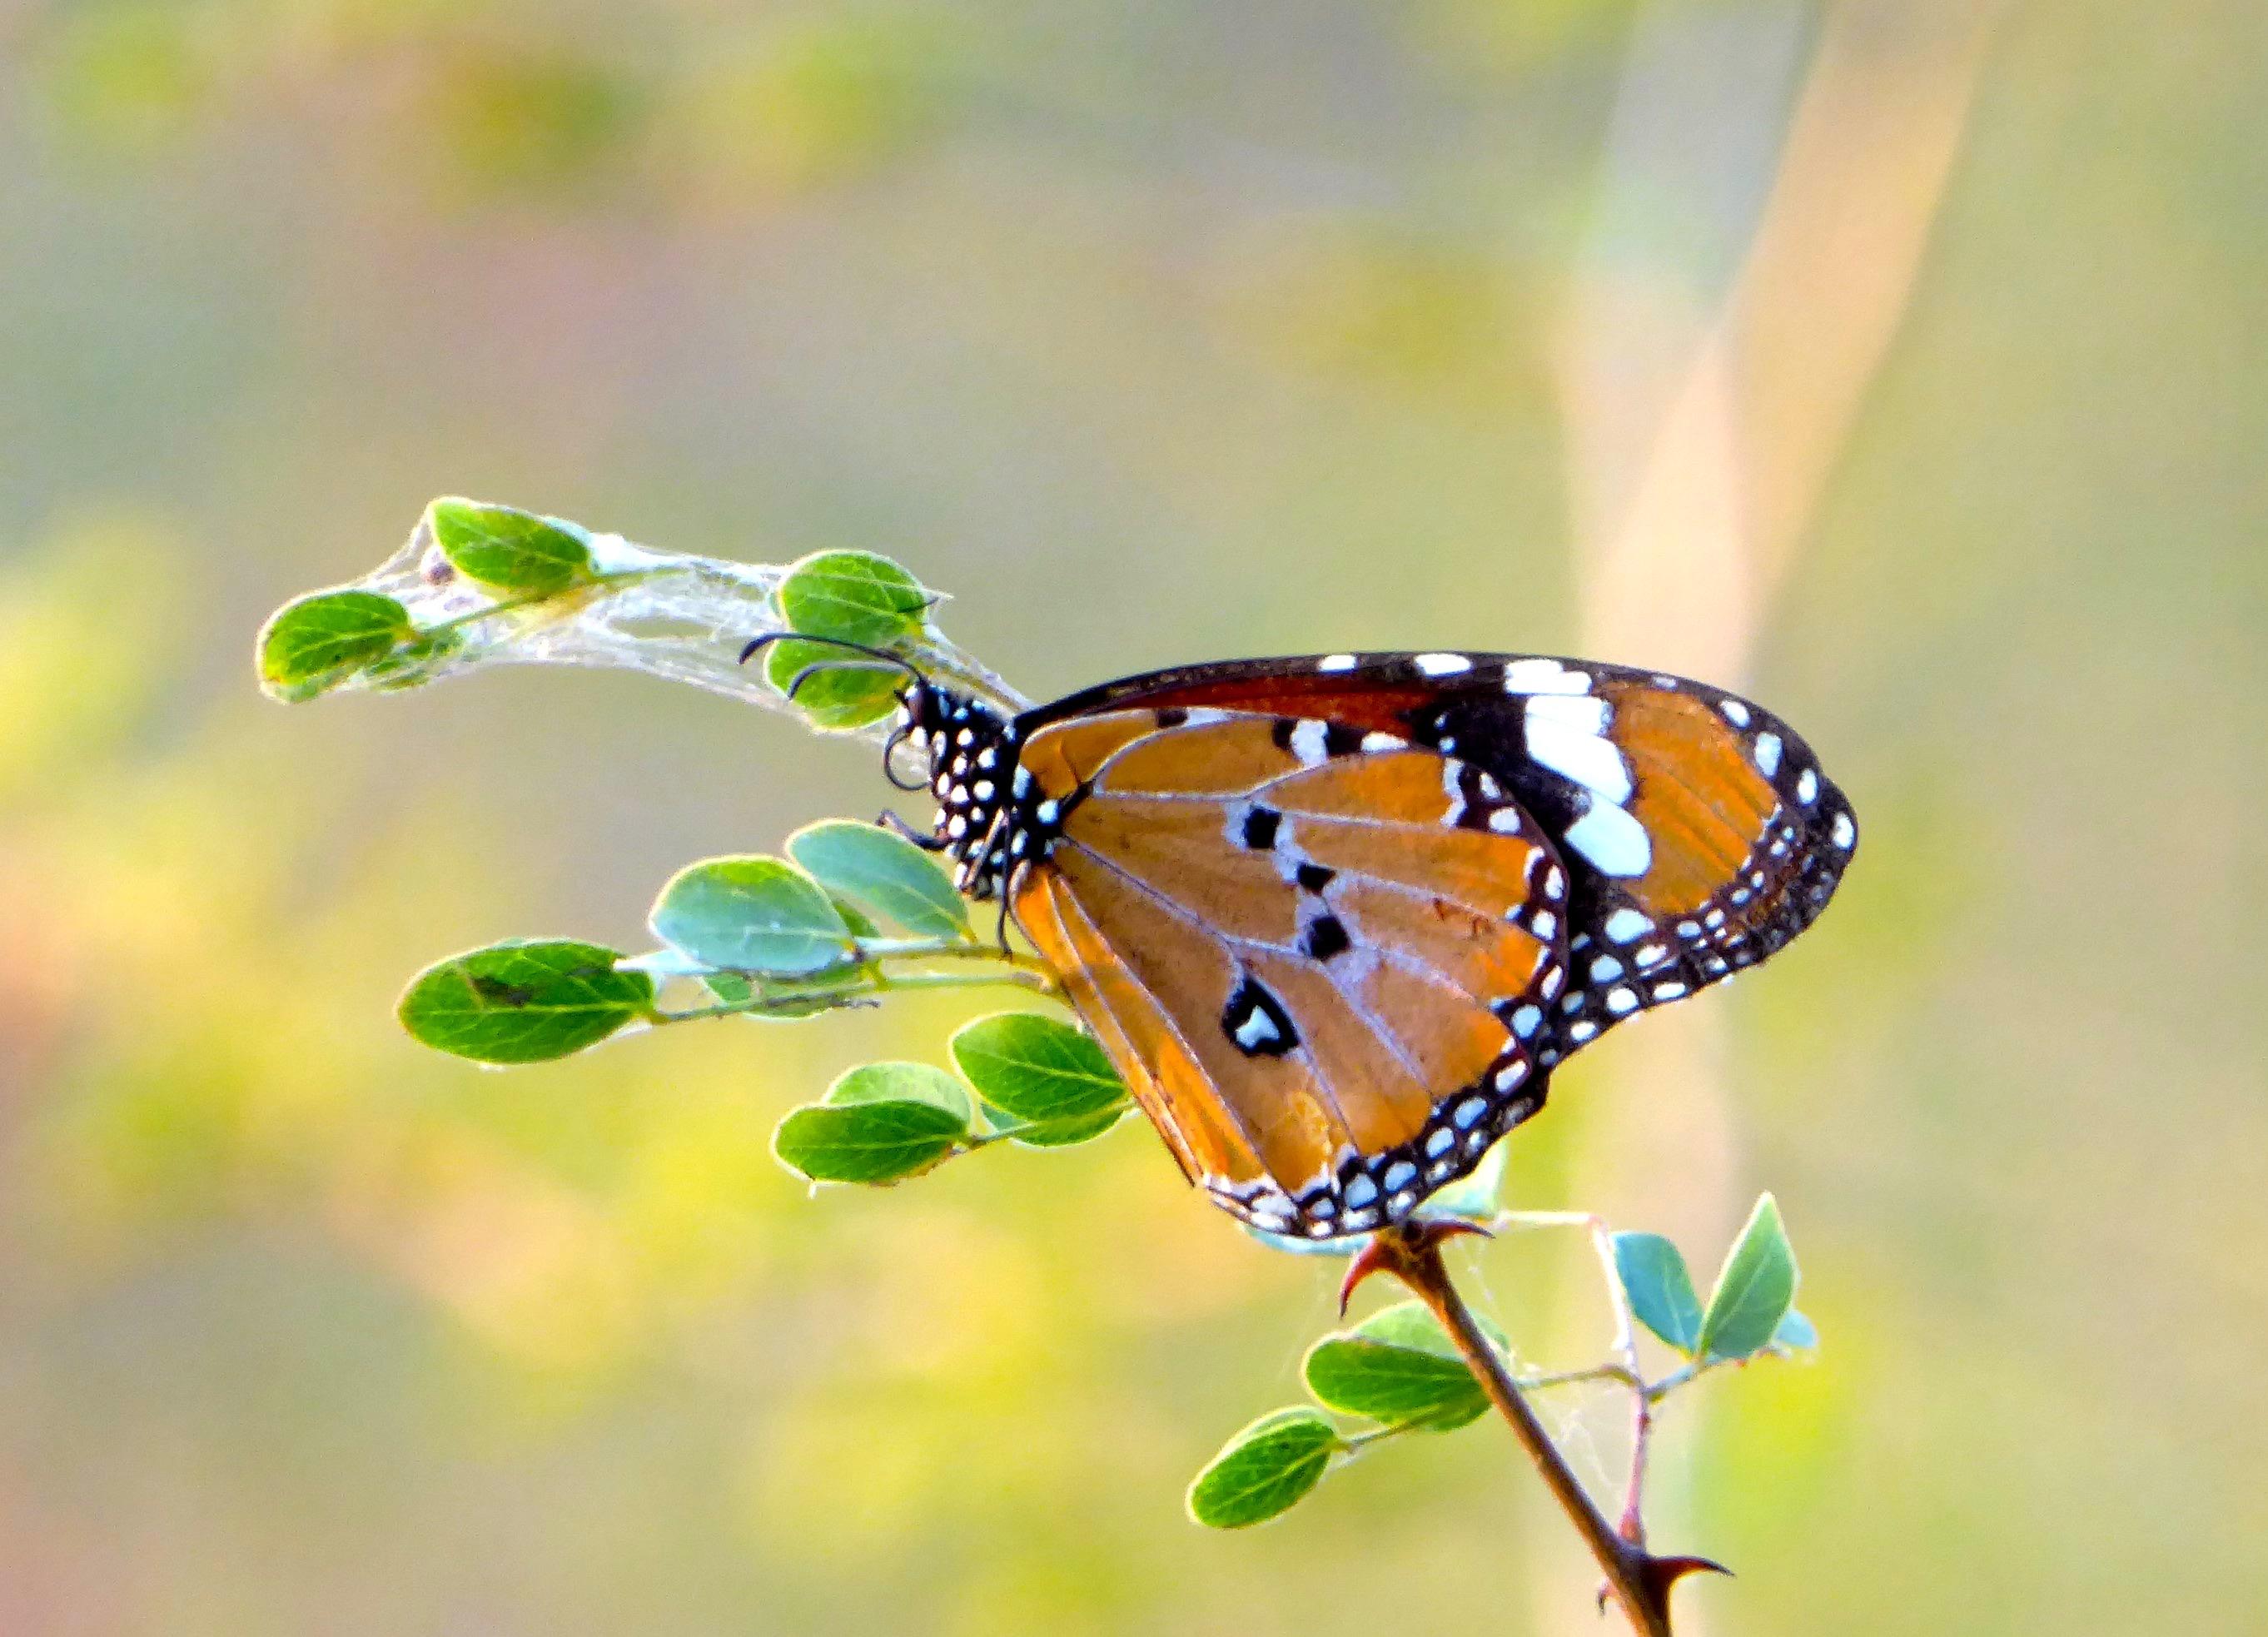 Lotri Bay, Lake Kariba, Zambia - Butterfly